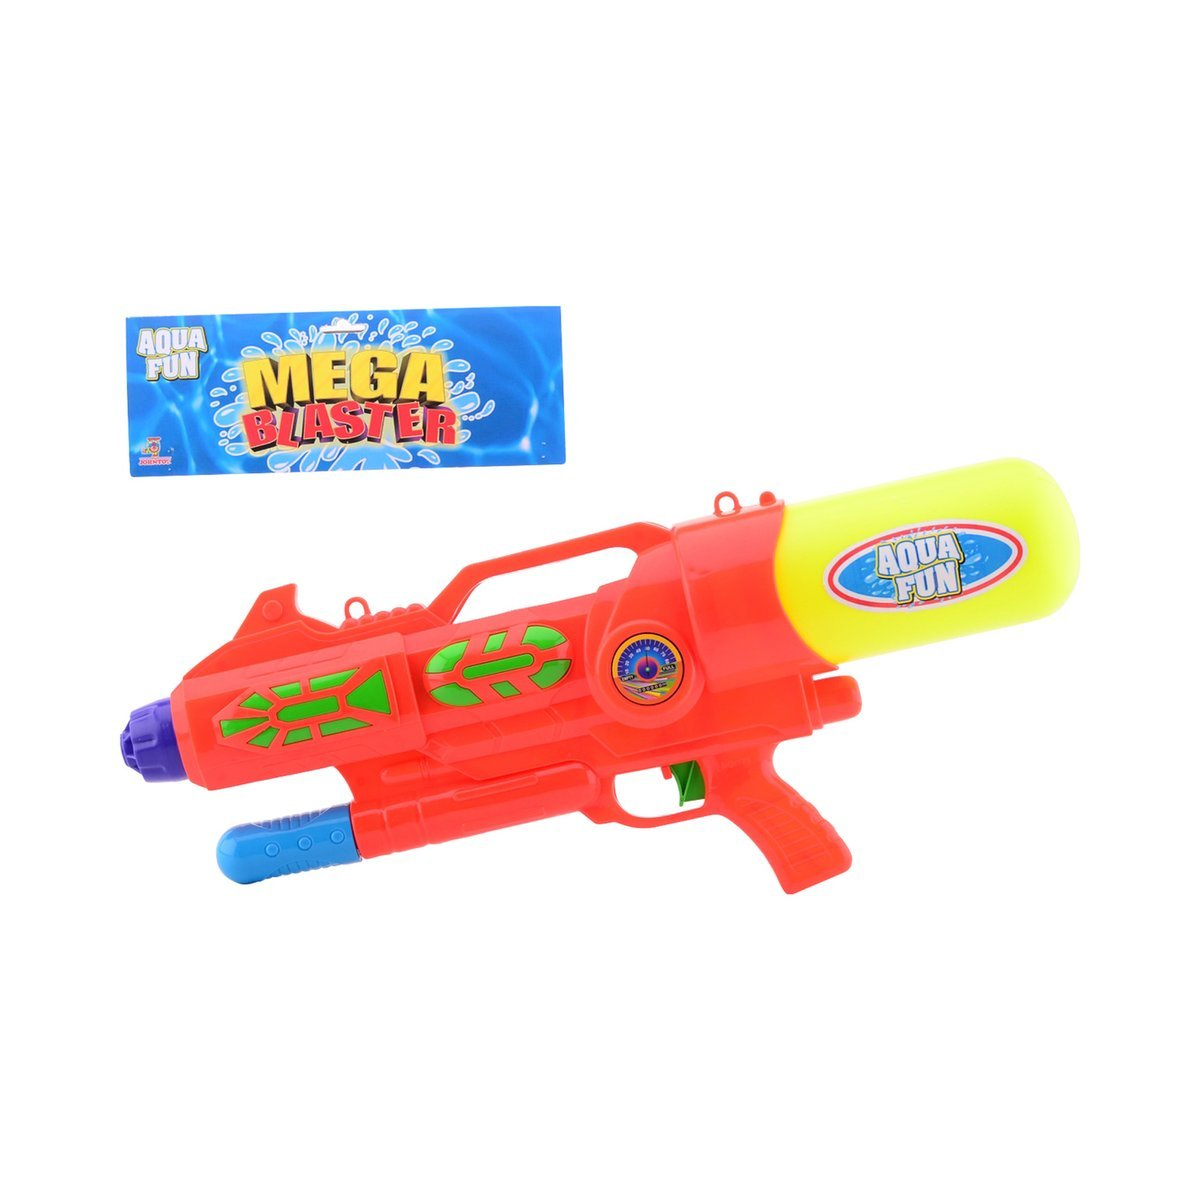 JohnToy 26932 Aqua Fun Mega Blaster